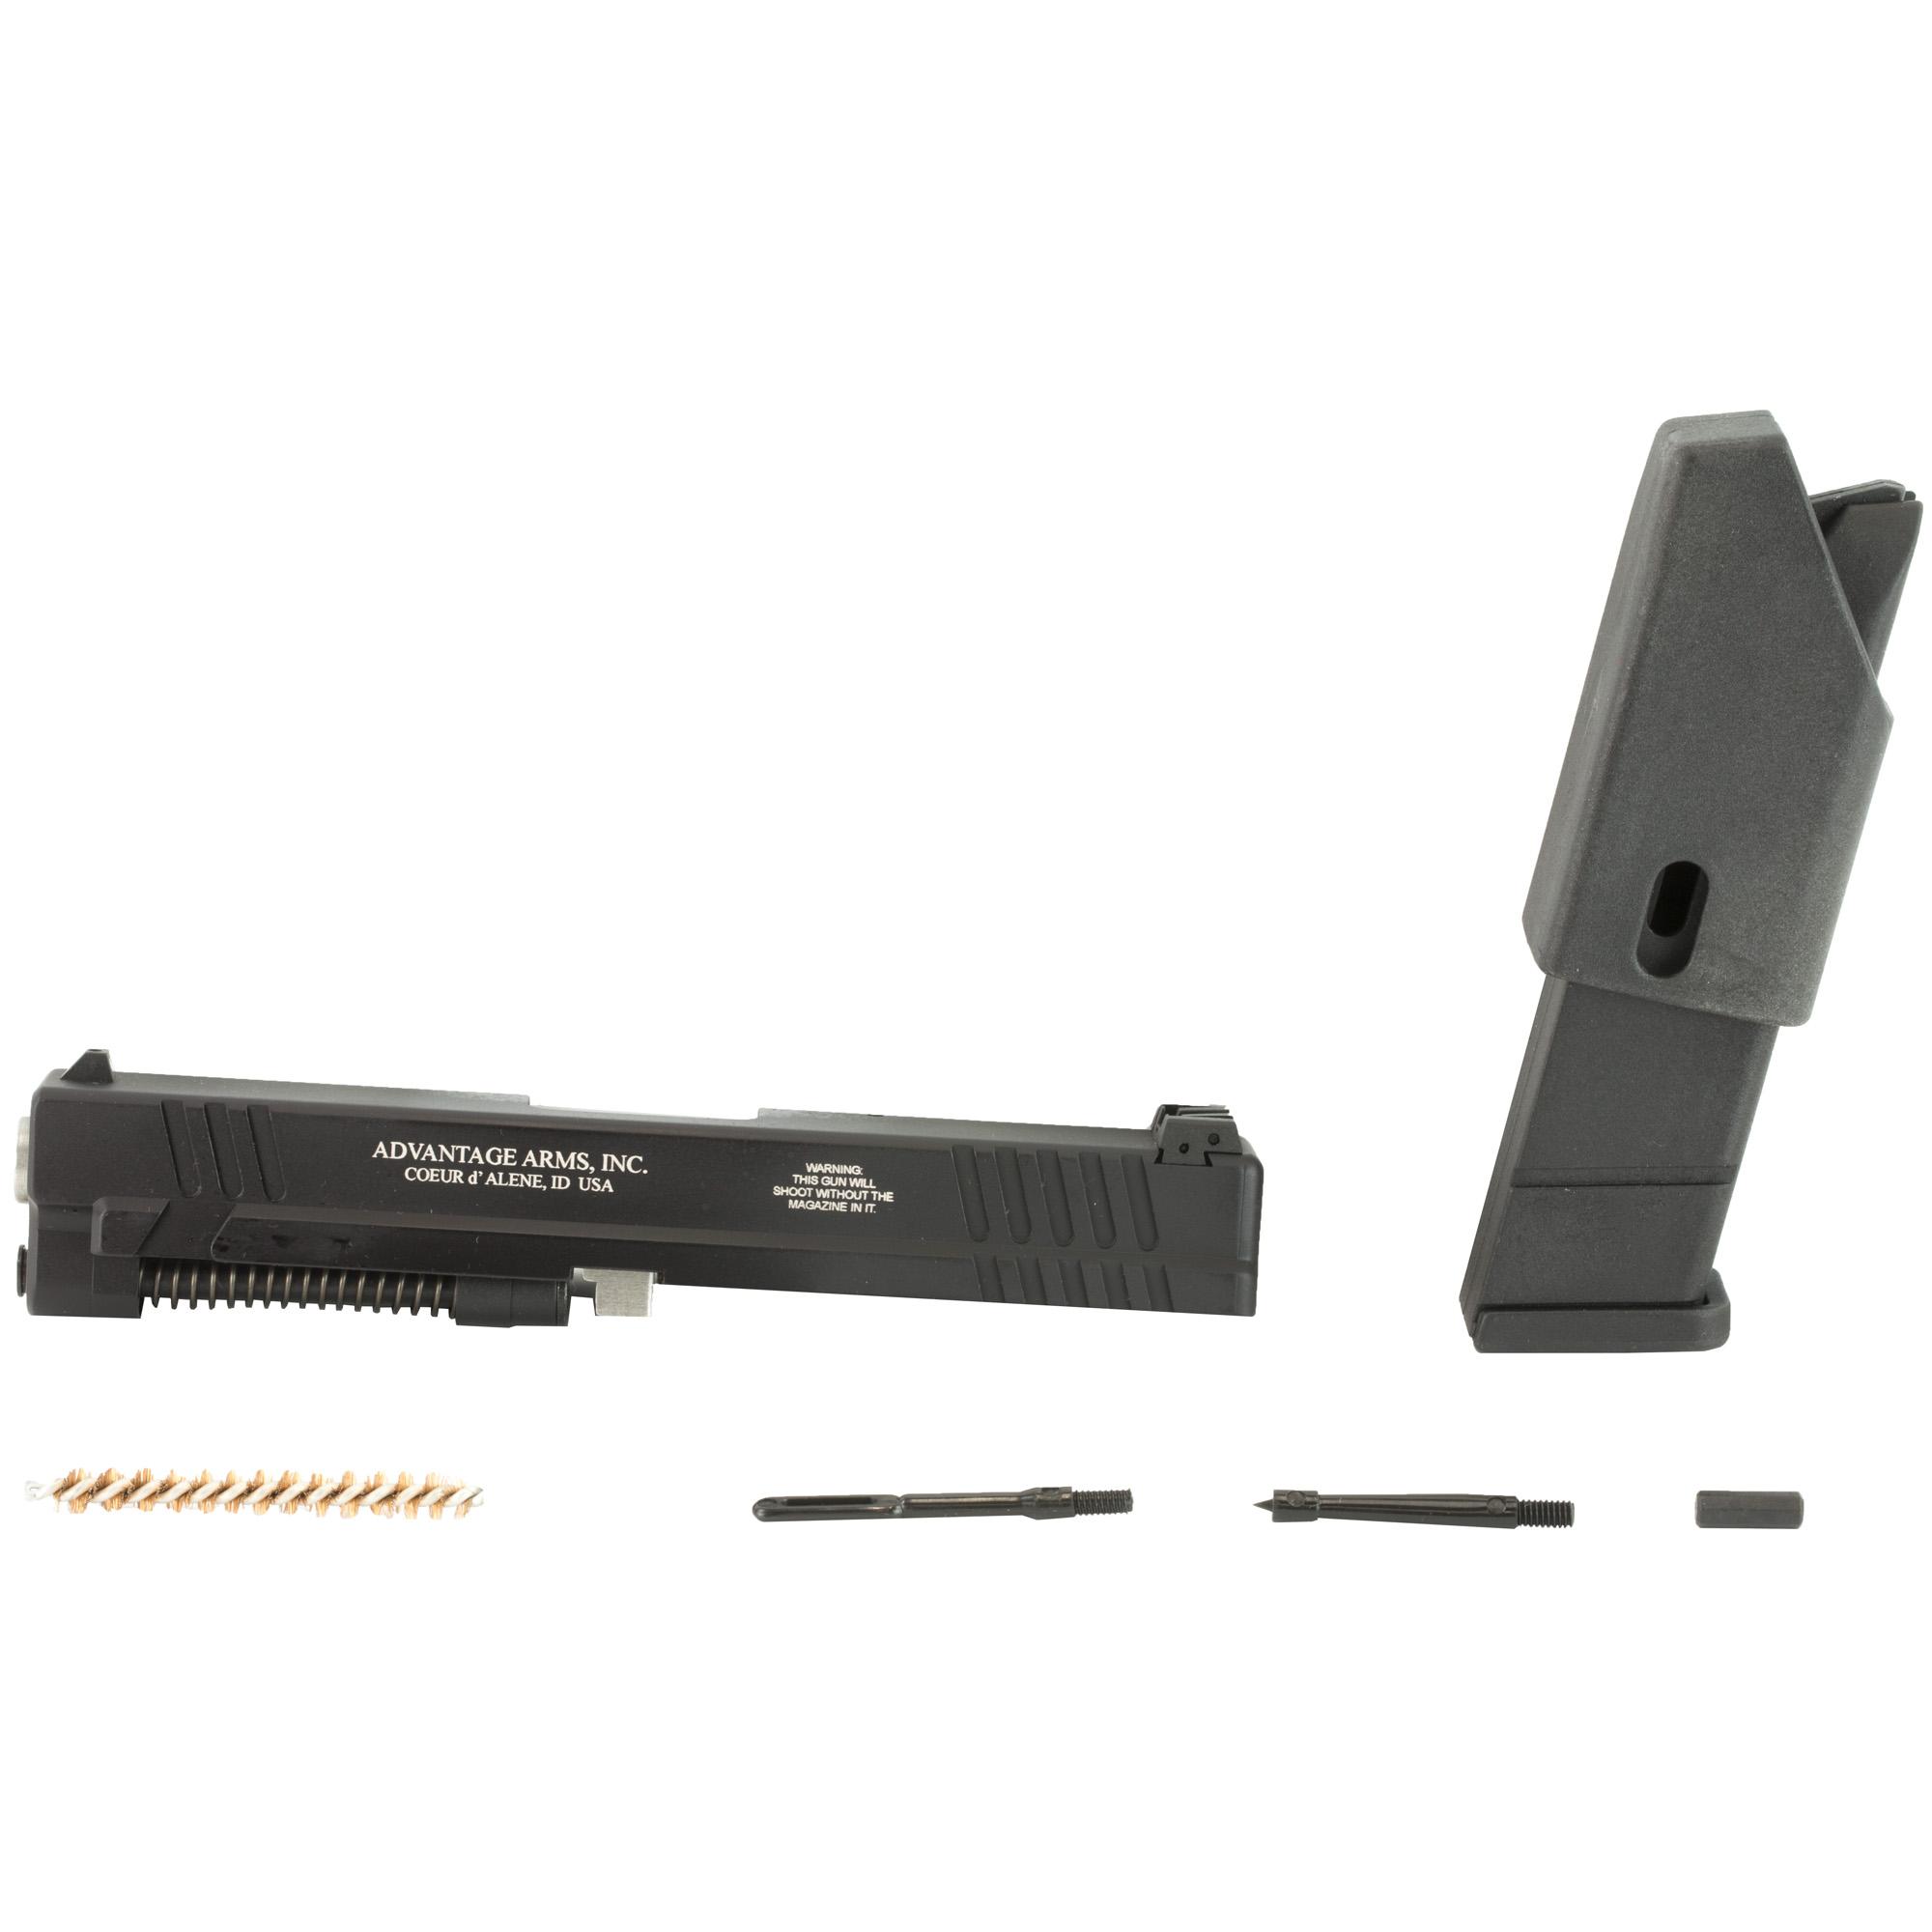 Advantage Arms Springfield XD 9/40  22 LR Conversion Kit w/10-Round Magazine